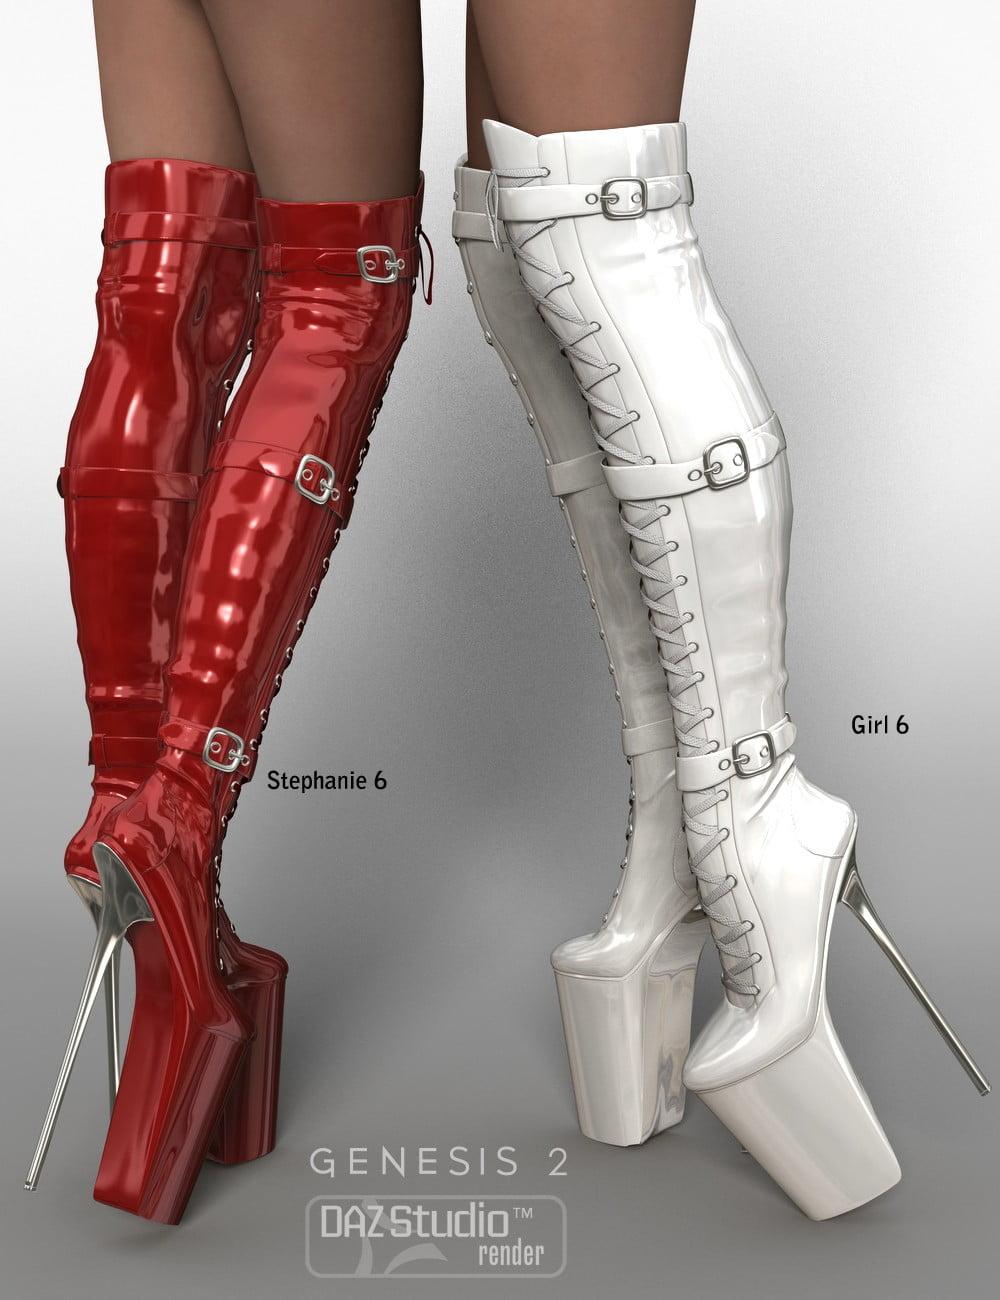 Nixtreme Boots 4 for Genesis 2 Female(s) - clothing, daz-poser-carrara